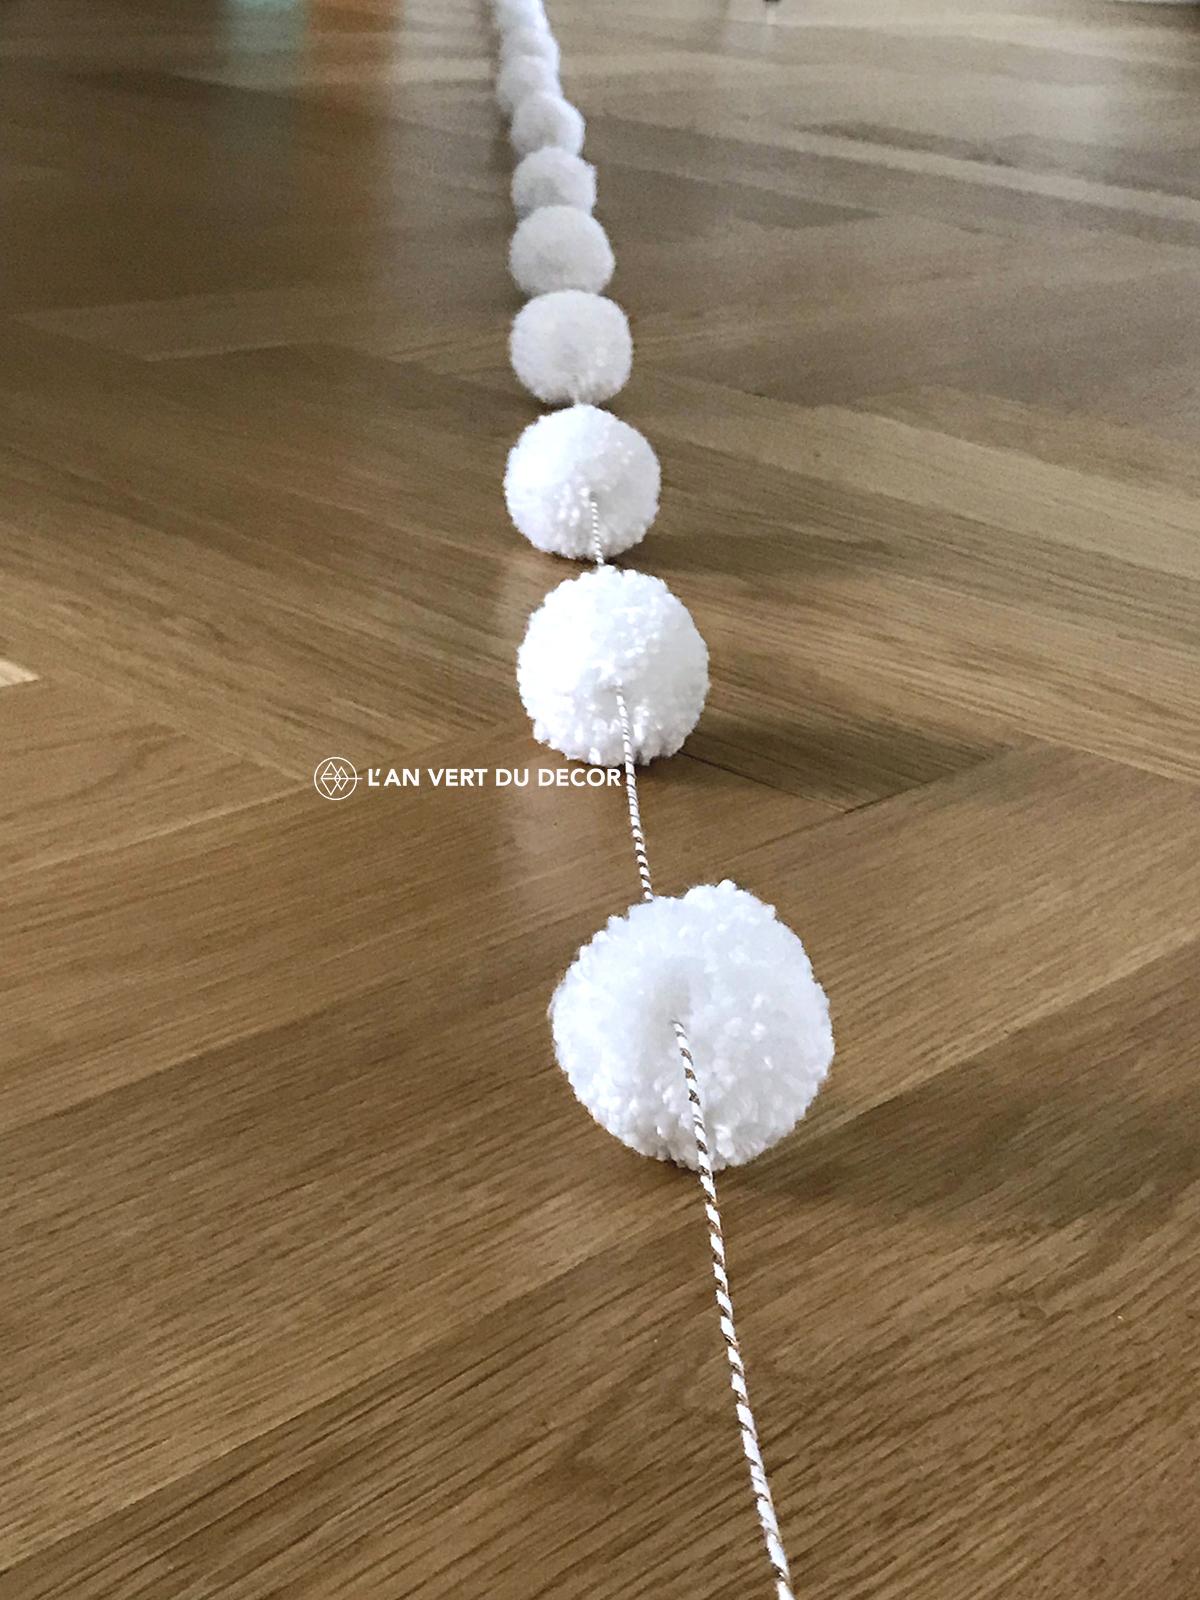 DIY - Guirlande de pompons | AVDD | Chloé Comte